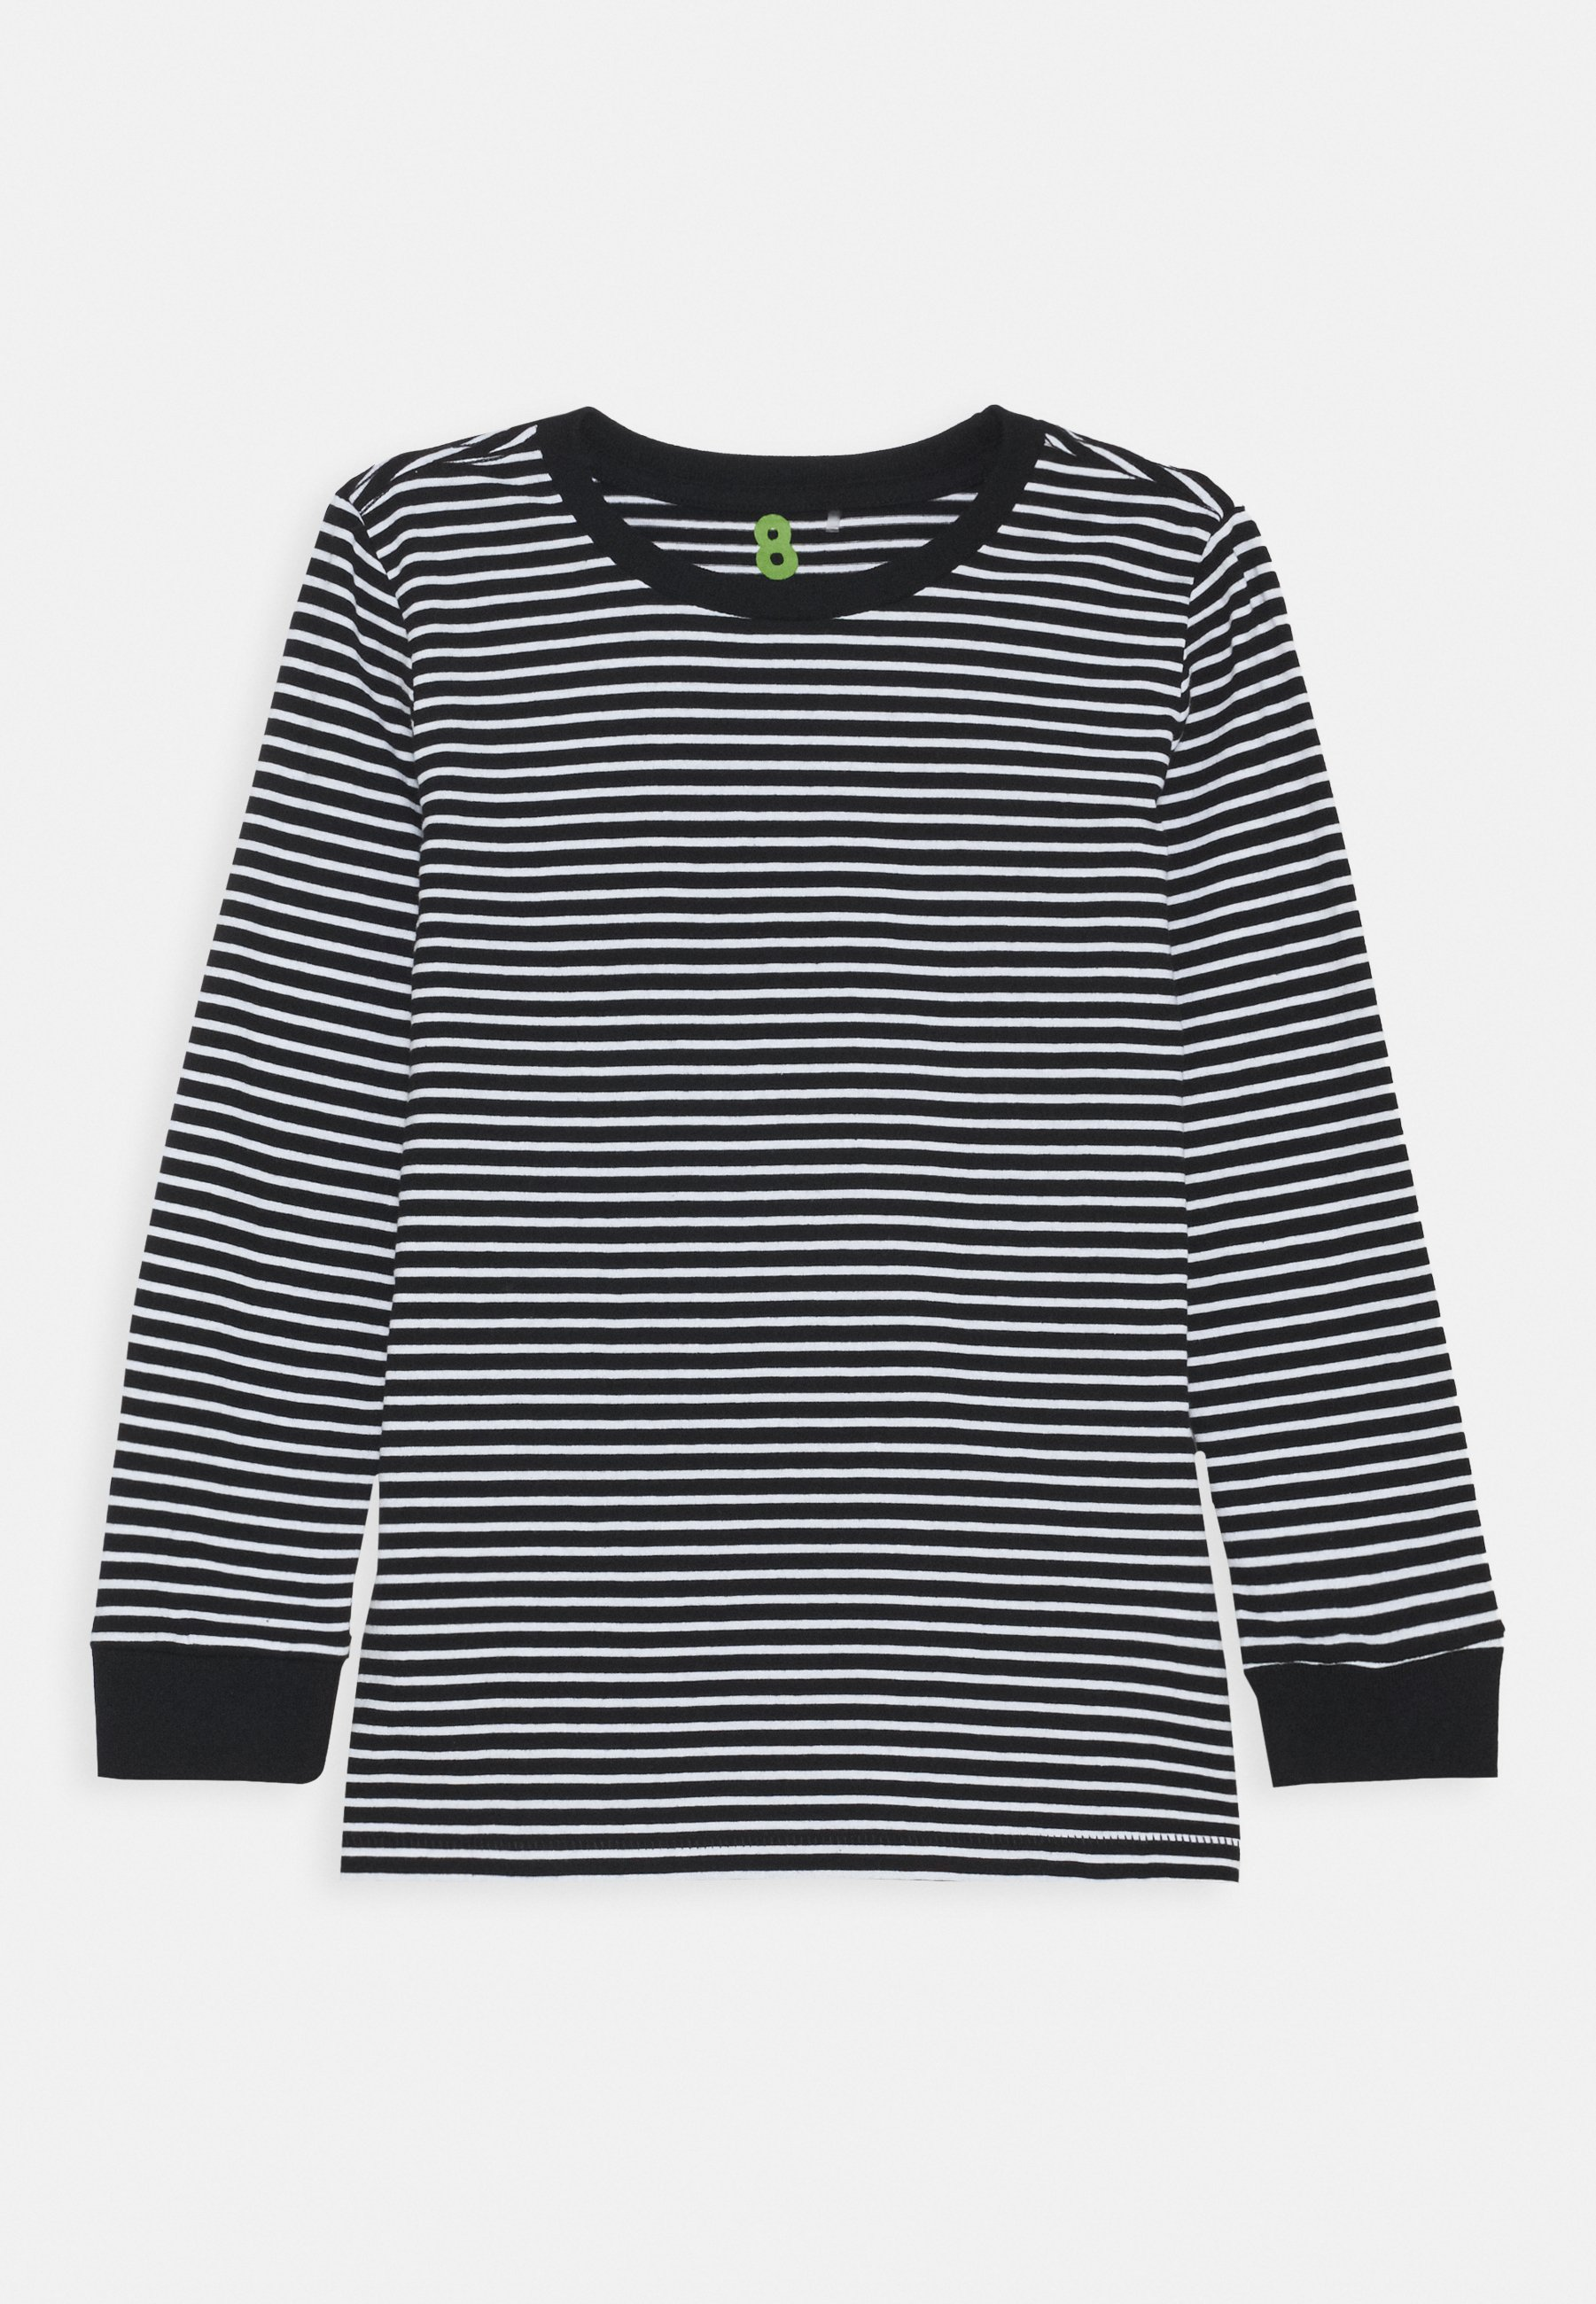 Cotton On Barnkläder online | Köp barnkläder online på